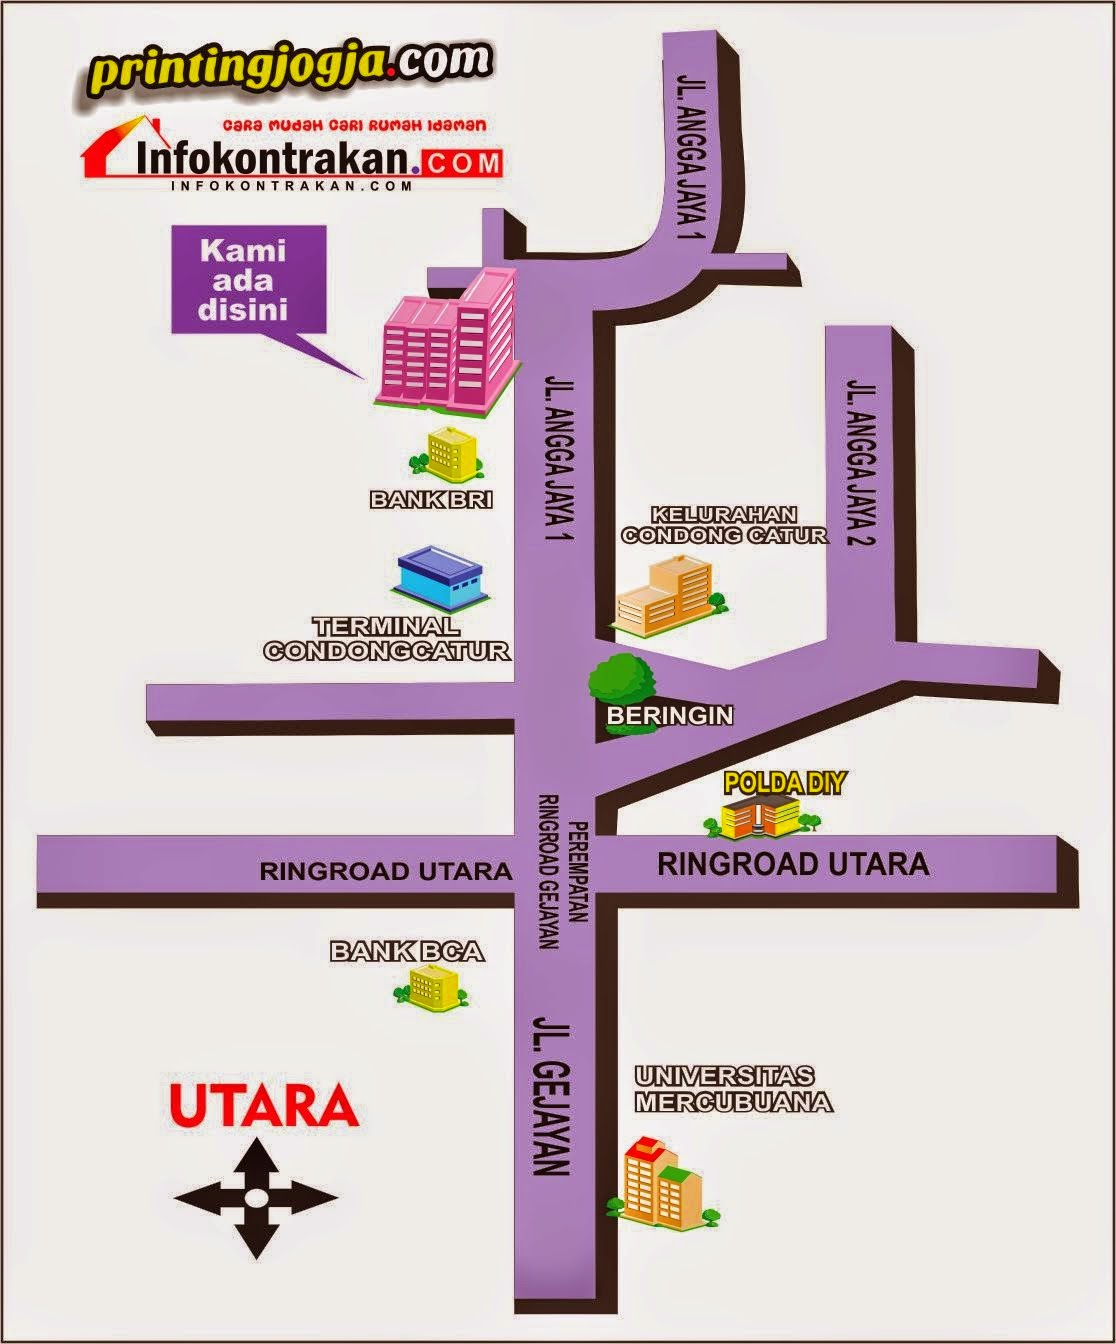 Lowongan Kerja di CV. Firmansyah Karya – Sleman Yogyakarta (Customer Service, Surveyor & Marketing)